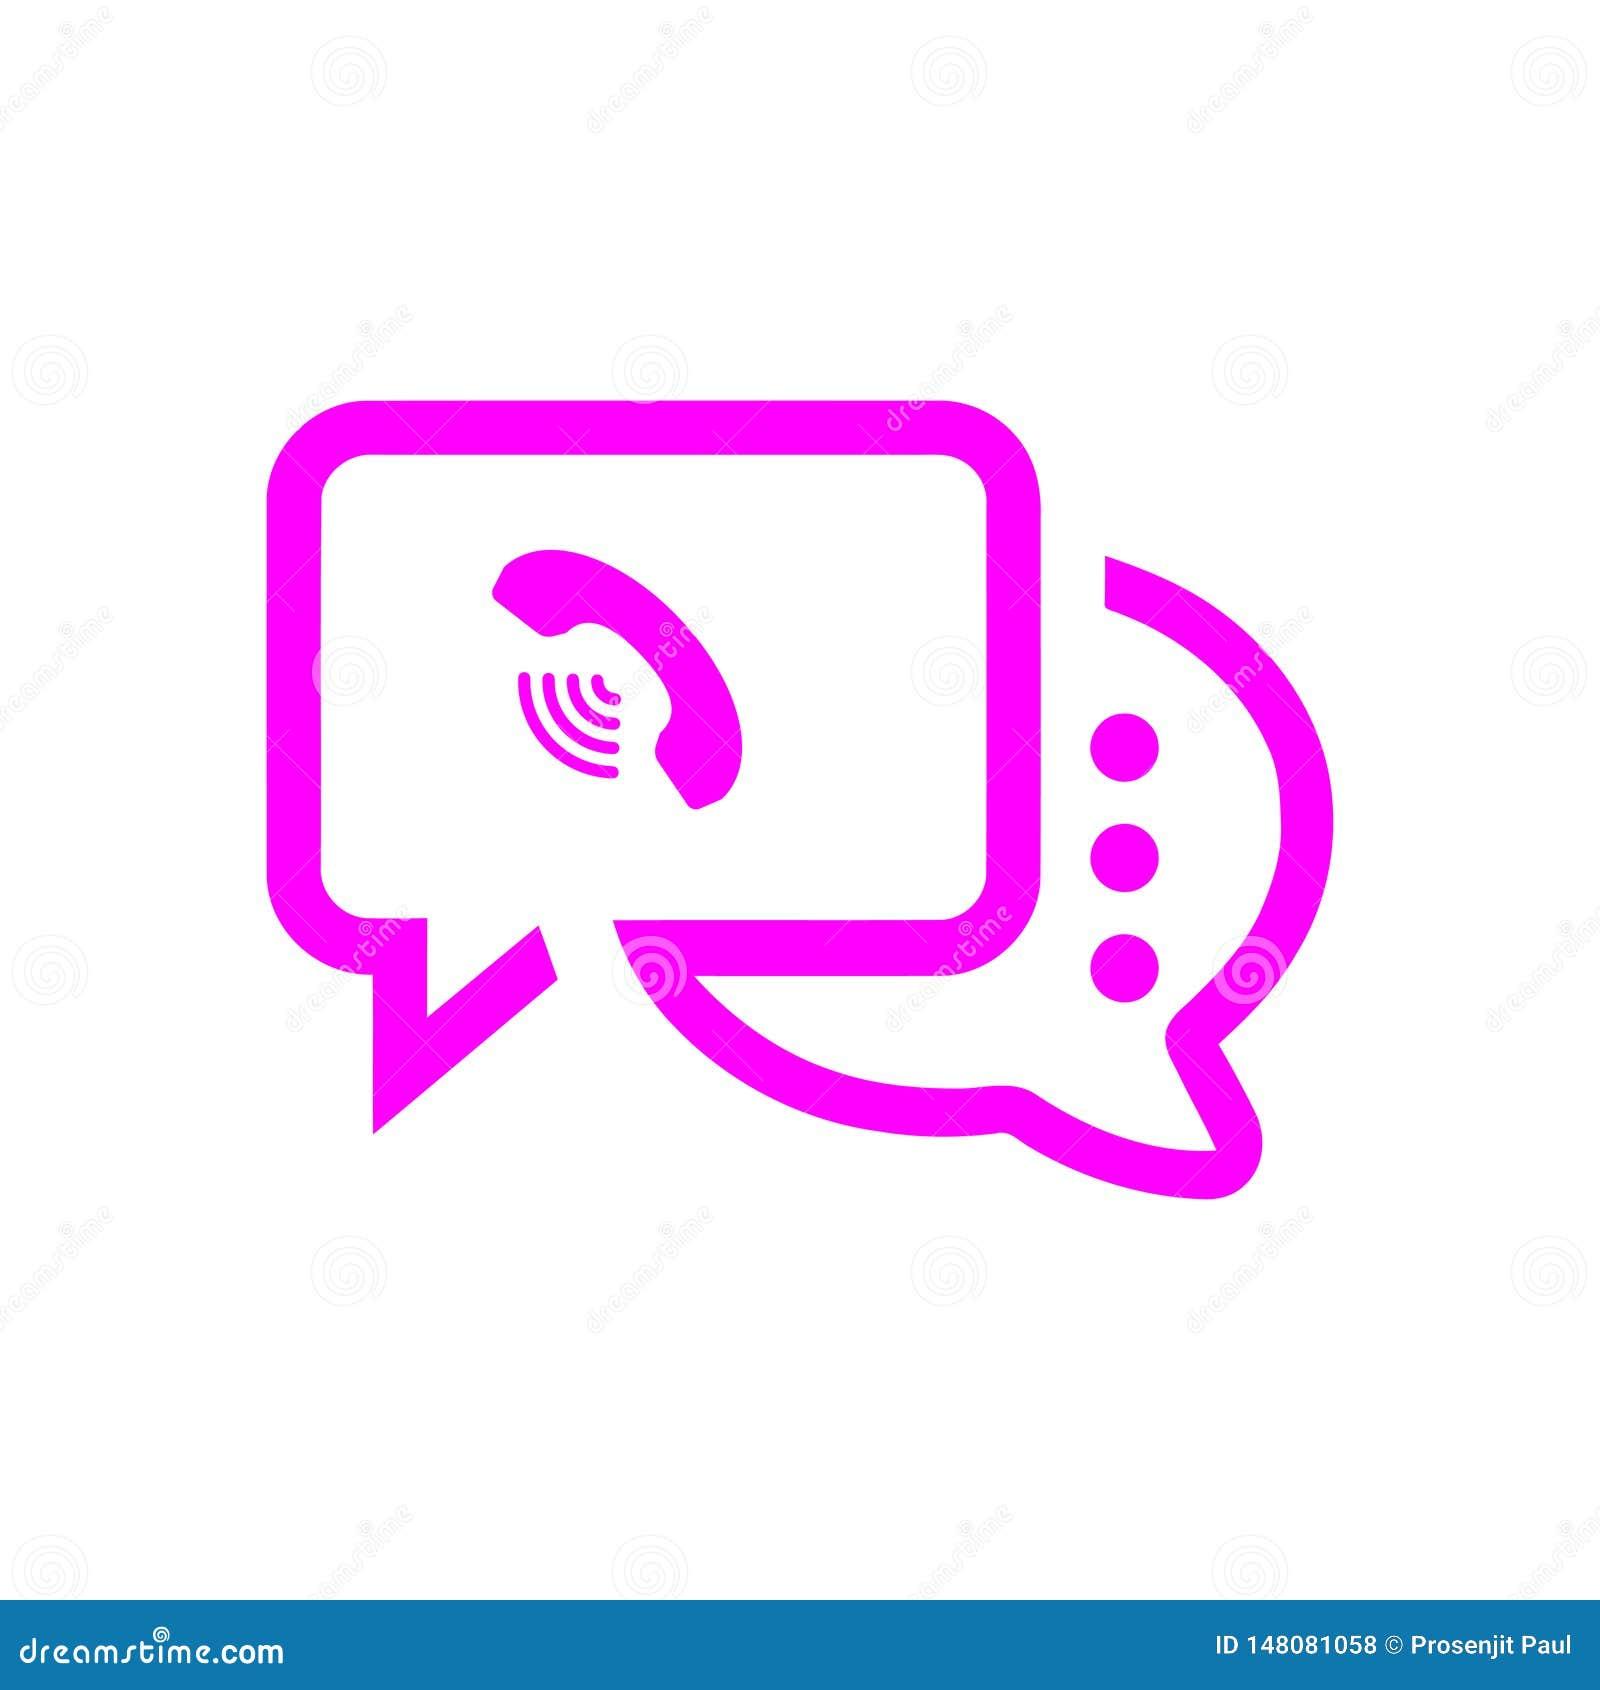 Het praatjepictogram, sms pictogram, praatje, bel, commentarenpictogram, mededeling, besprekingspictogram, vraag, groep sms, toes